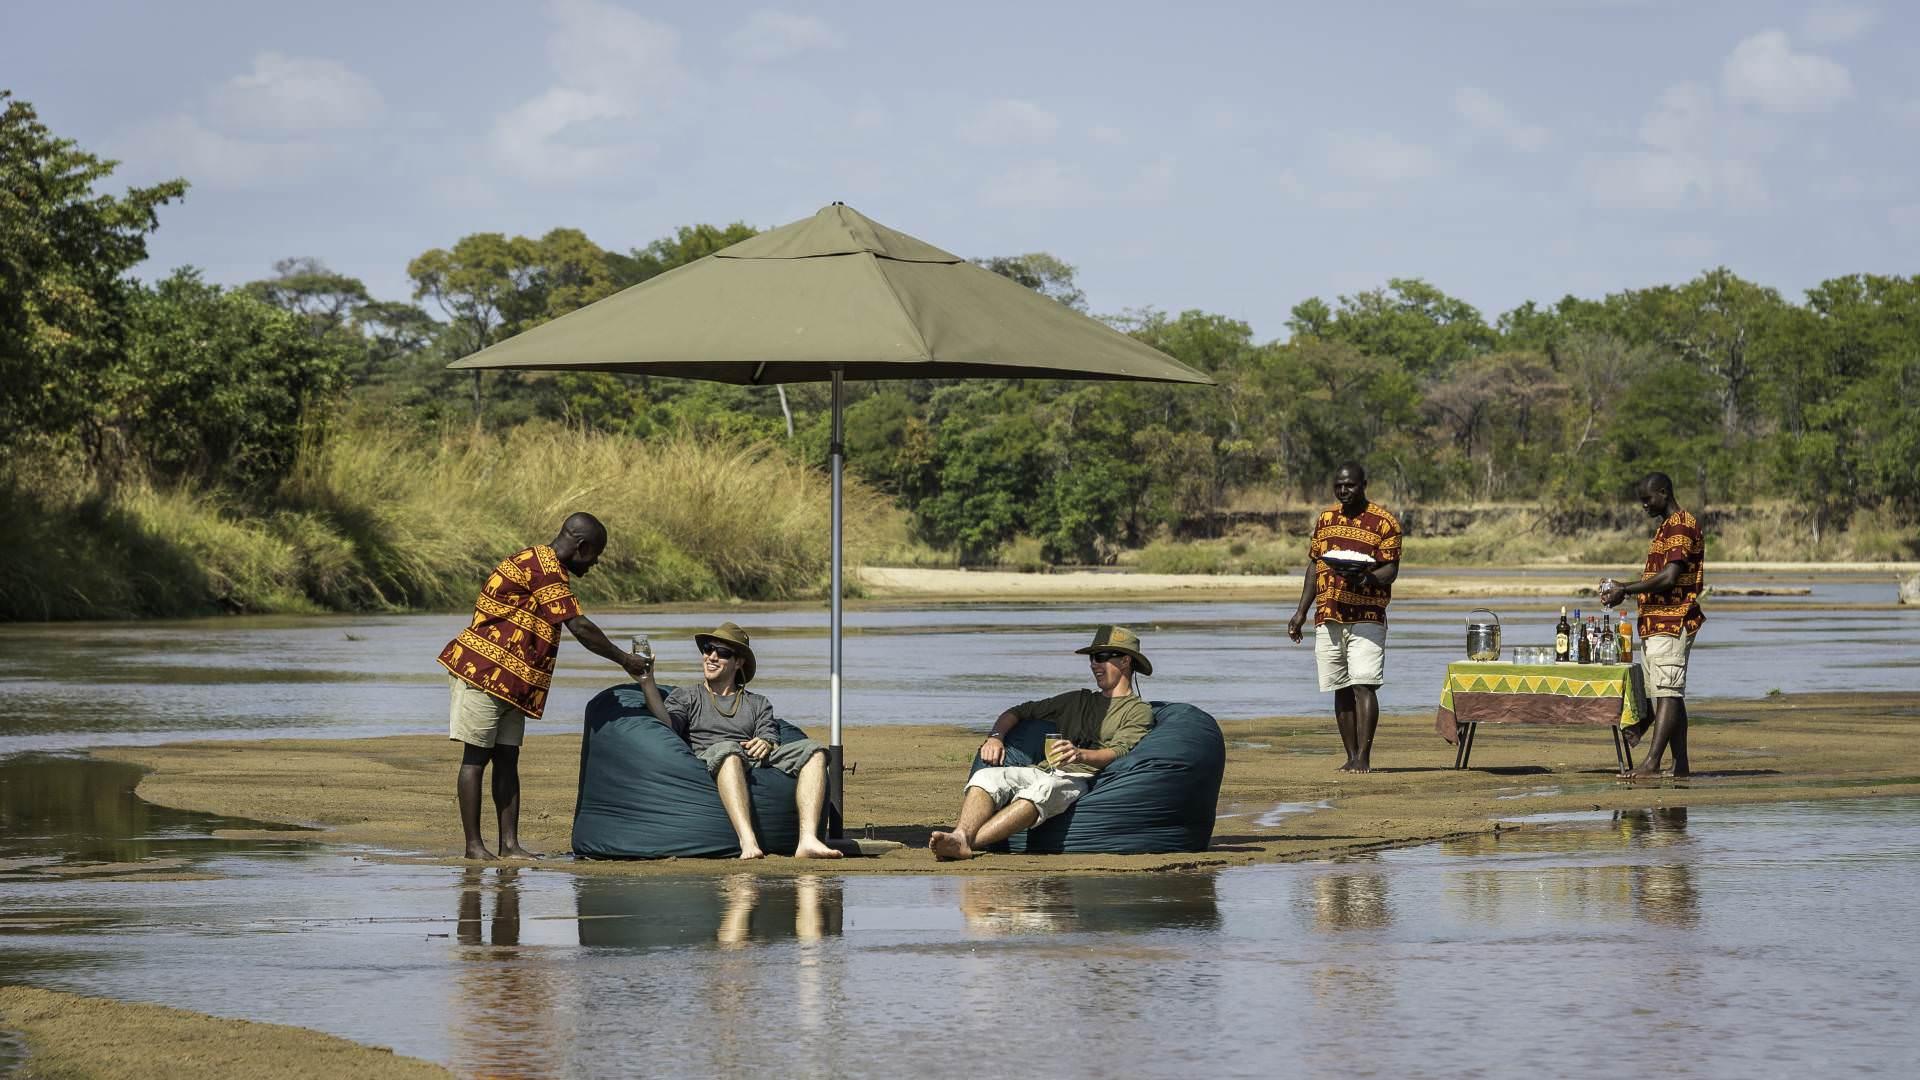 Cooling off on safari